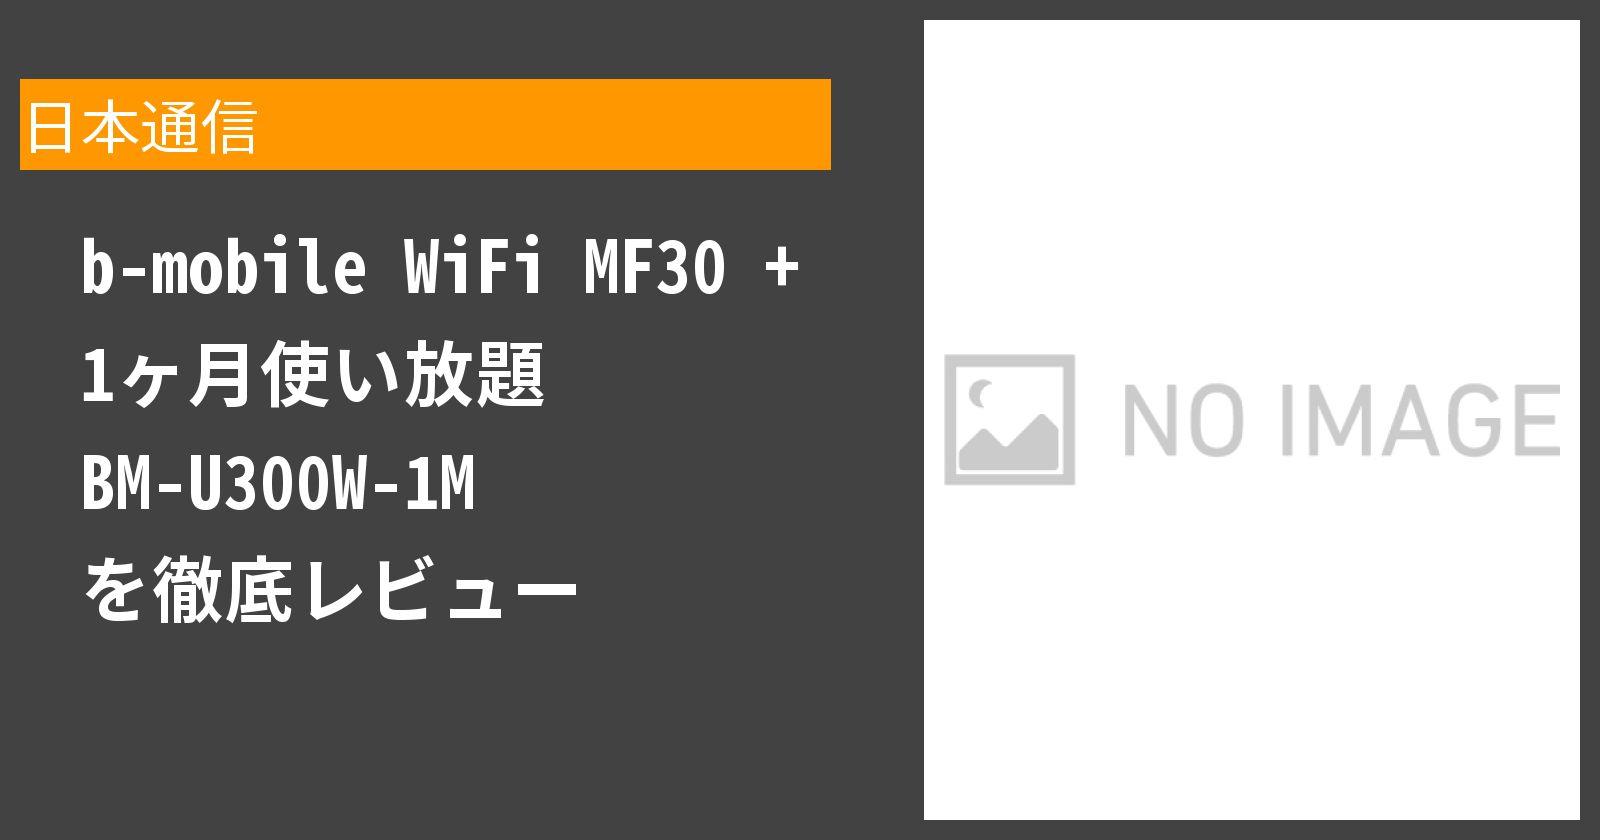 b-mobile WiFi MF30 + 1ヶ月使い放題 BM-U300W-1Mを徹底評価